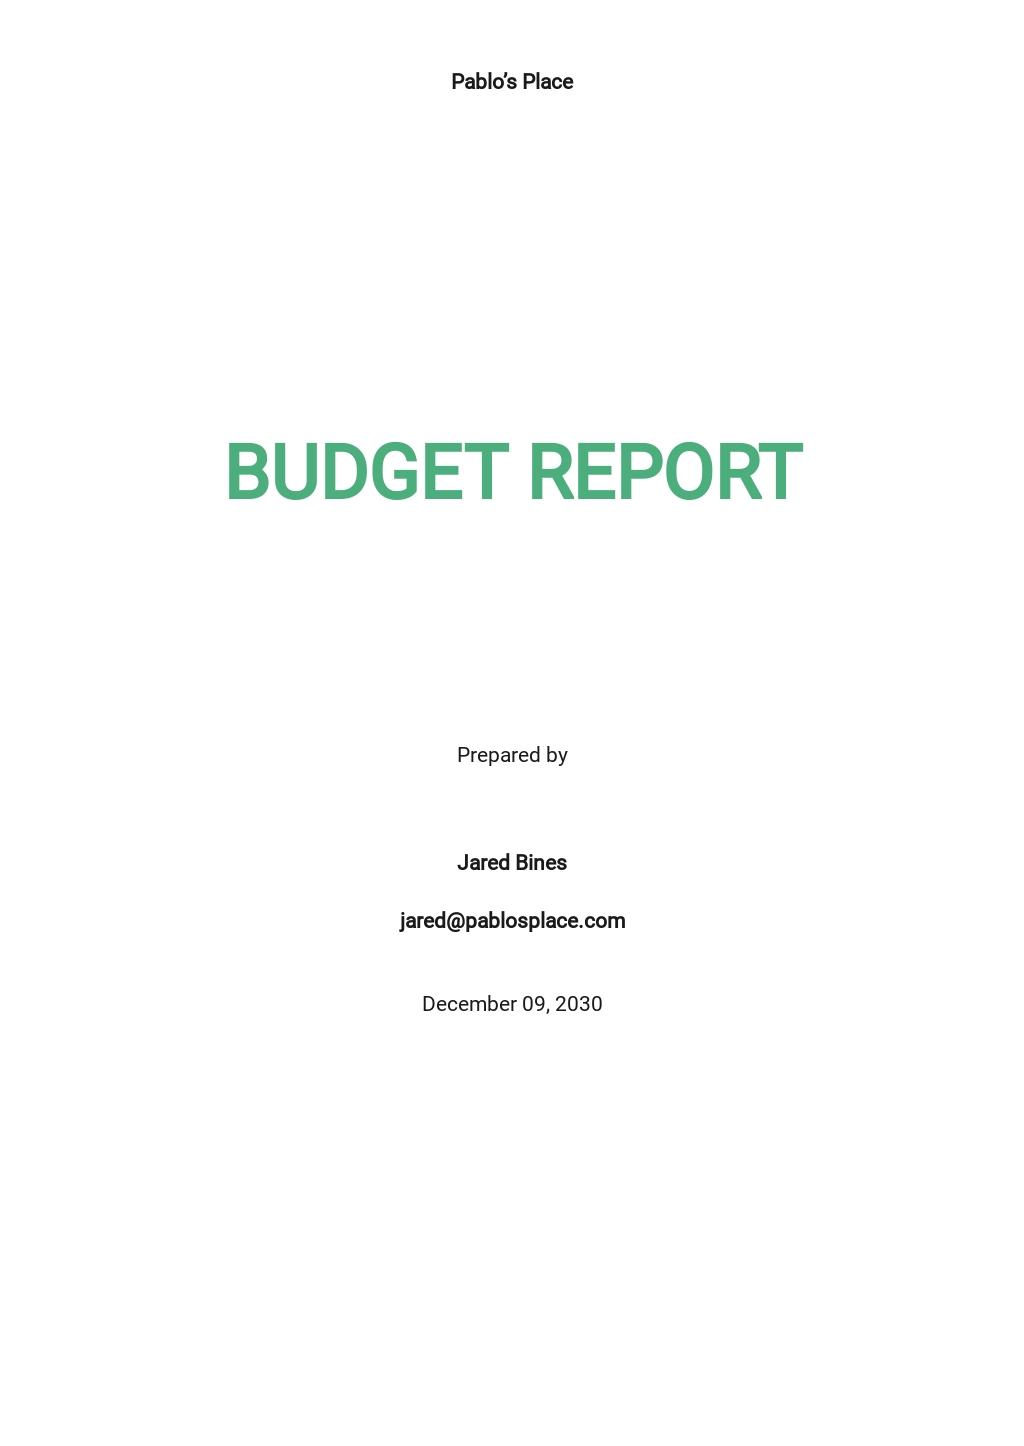 Budget Report Template [Free PDF] - Google Docs, Word